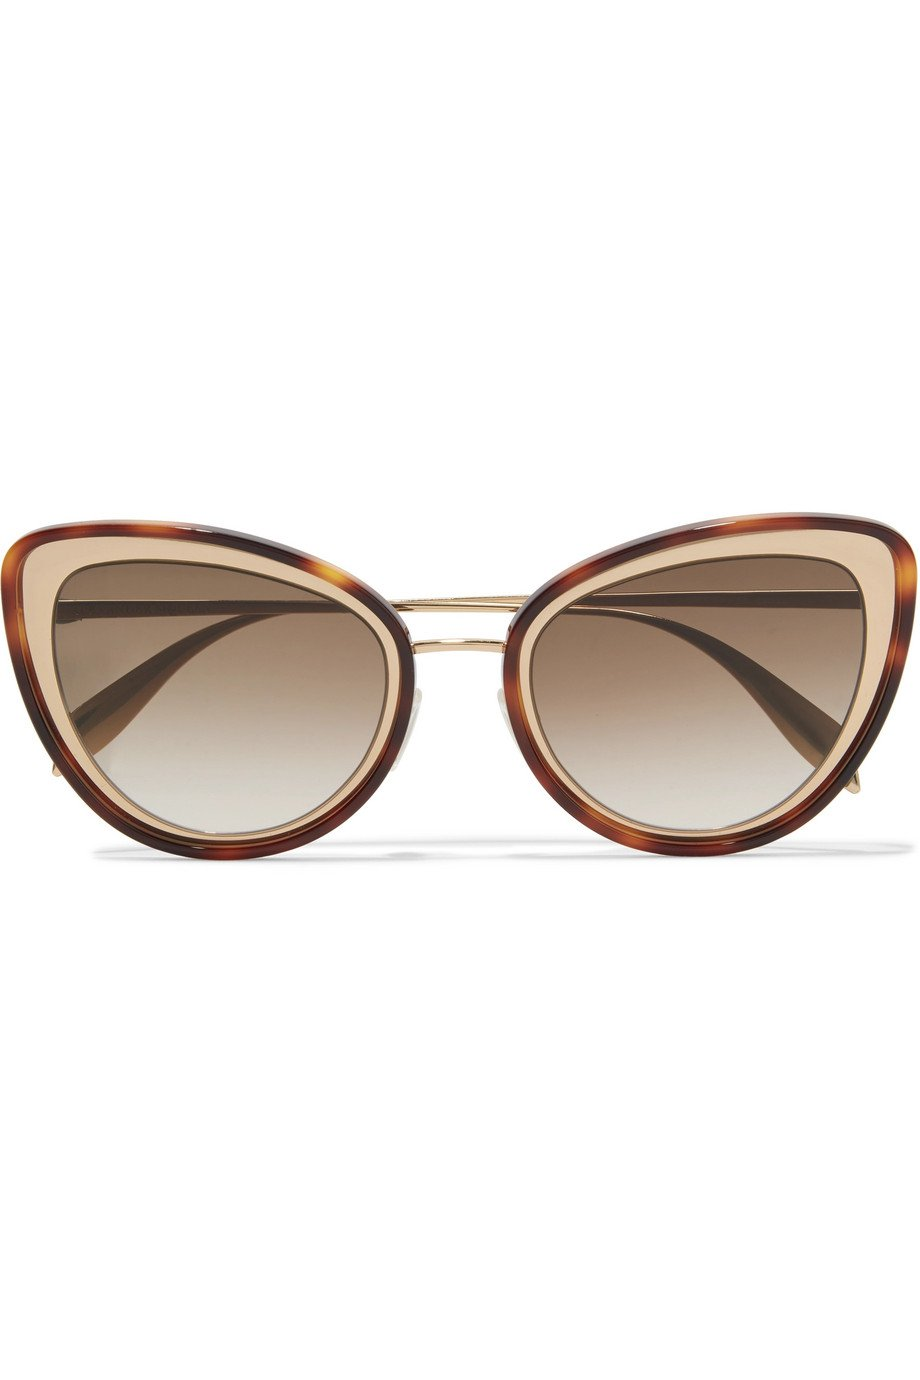 Alexander McQueen | Cat-eye tortoiseshell acetate and gold-tone sunglasses | NET-A-PORTER.COM